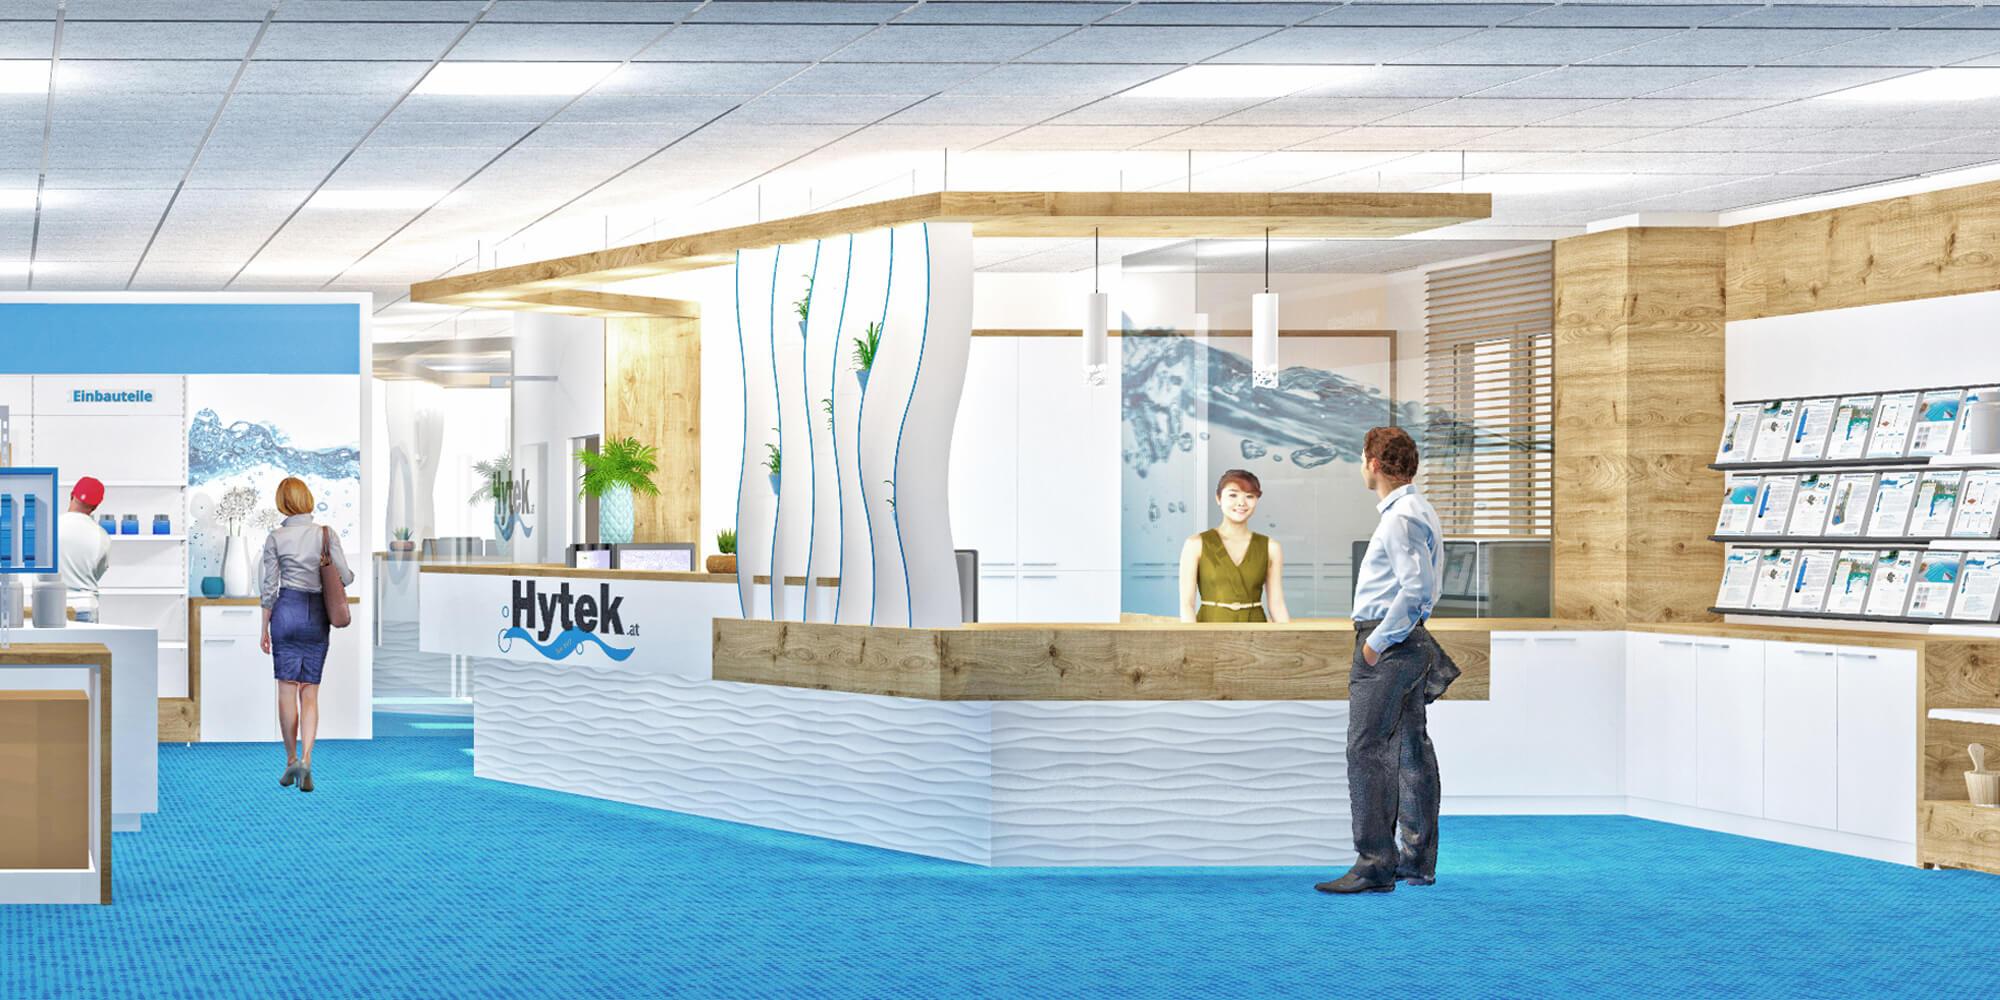 Cre-Plan-Design-Architektur-Innenarchitektur-Design-Projekt-Referenz-Hytek-08